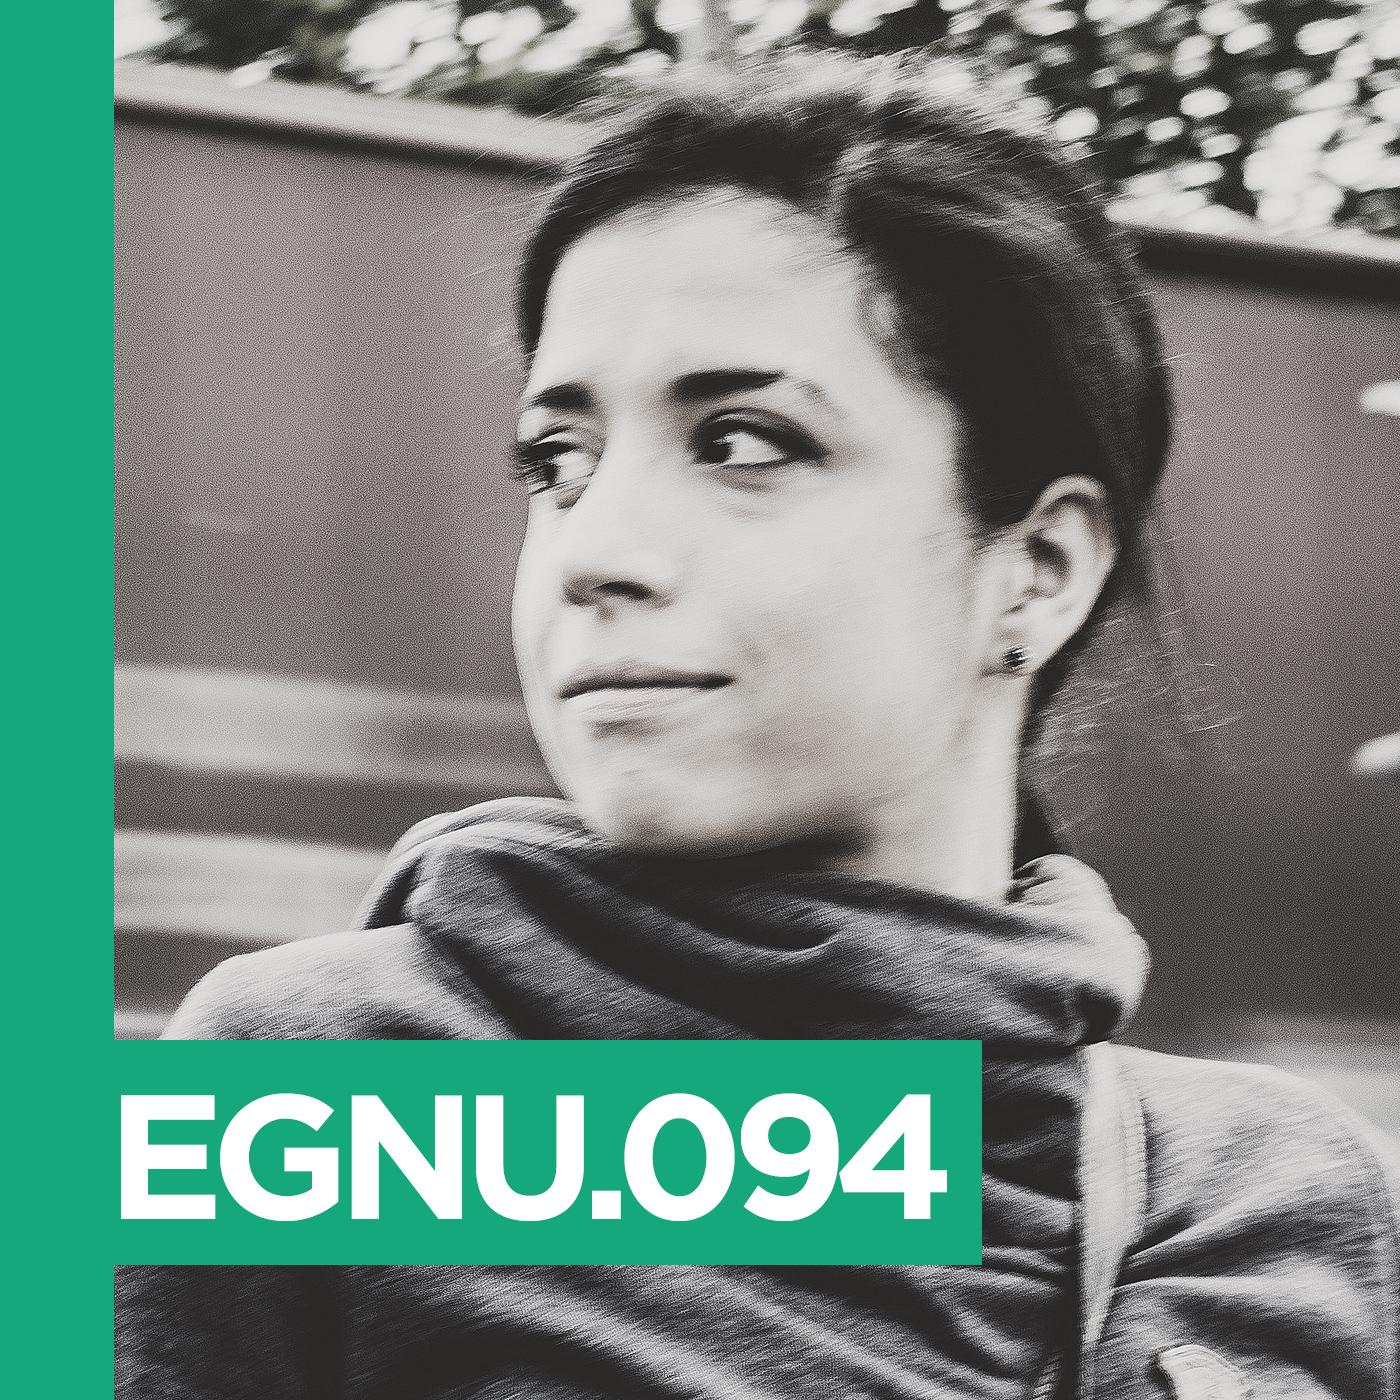 EGNU.094 Niki